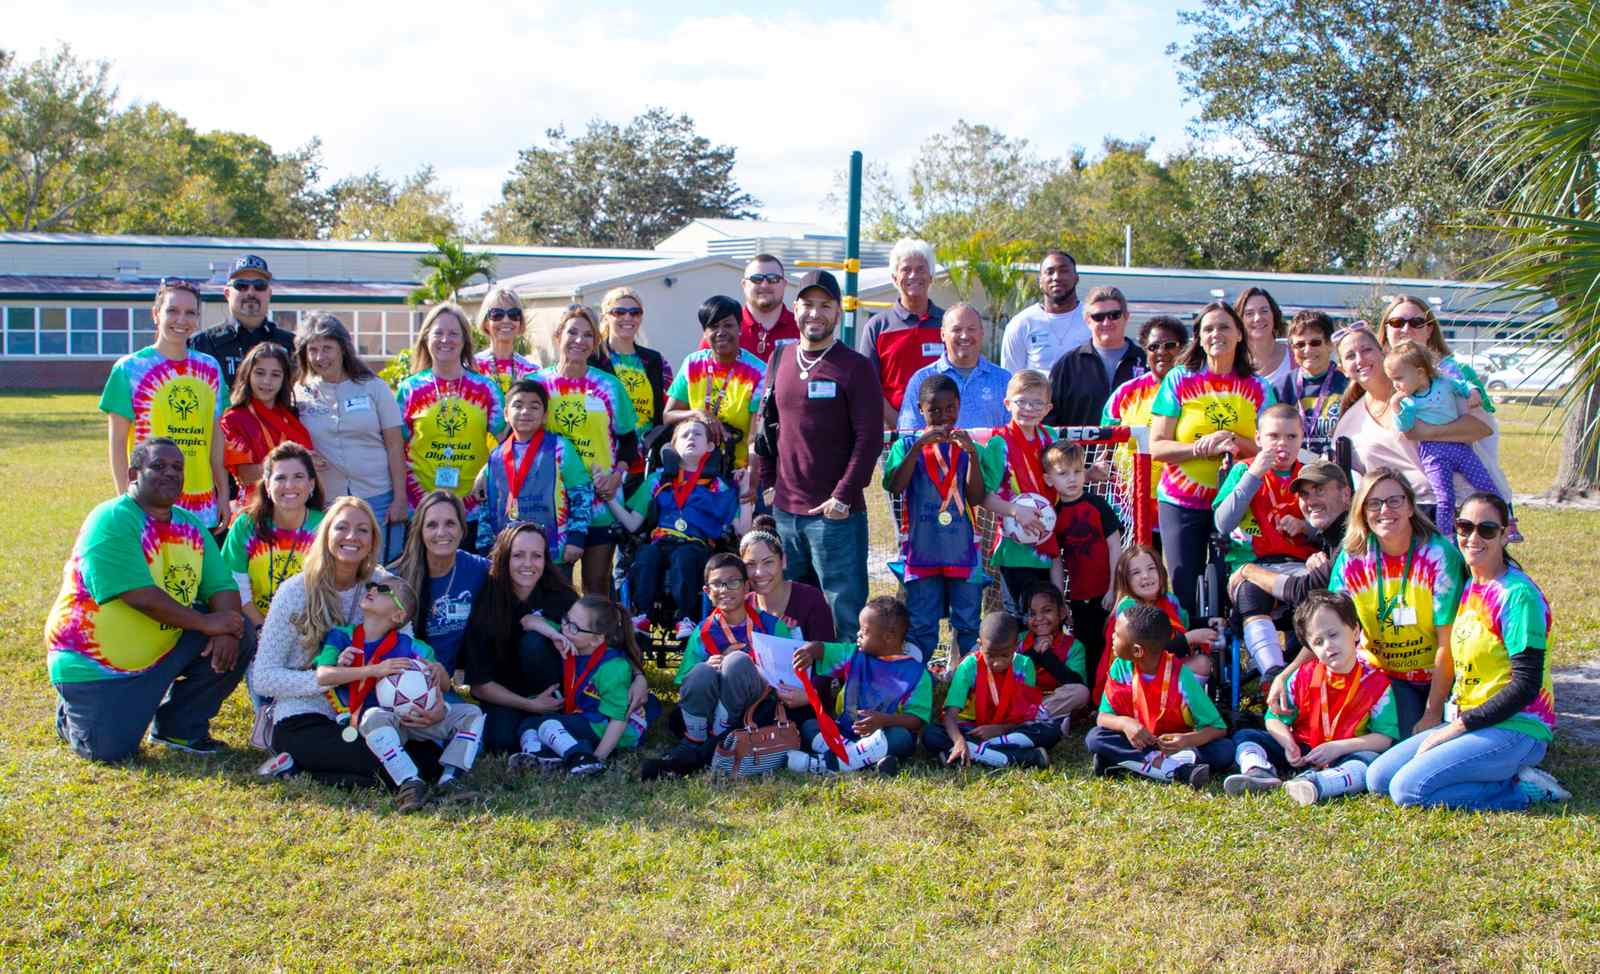 Youth & Adaptive Sports